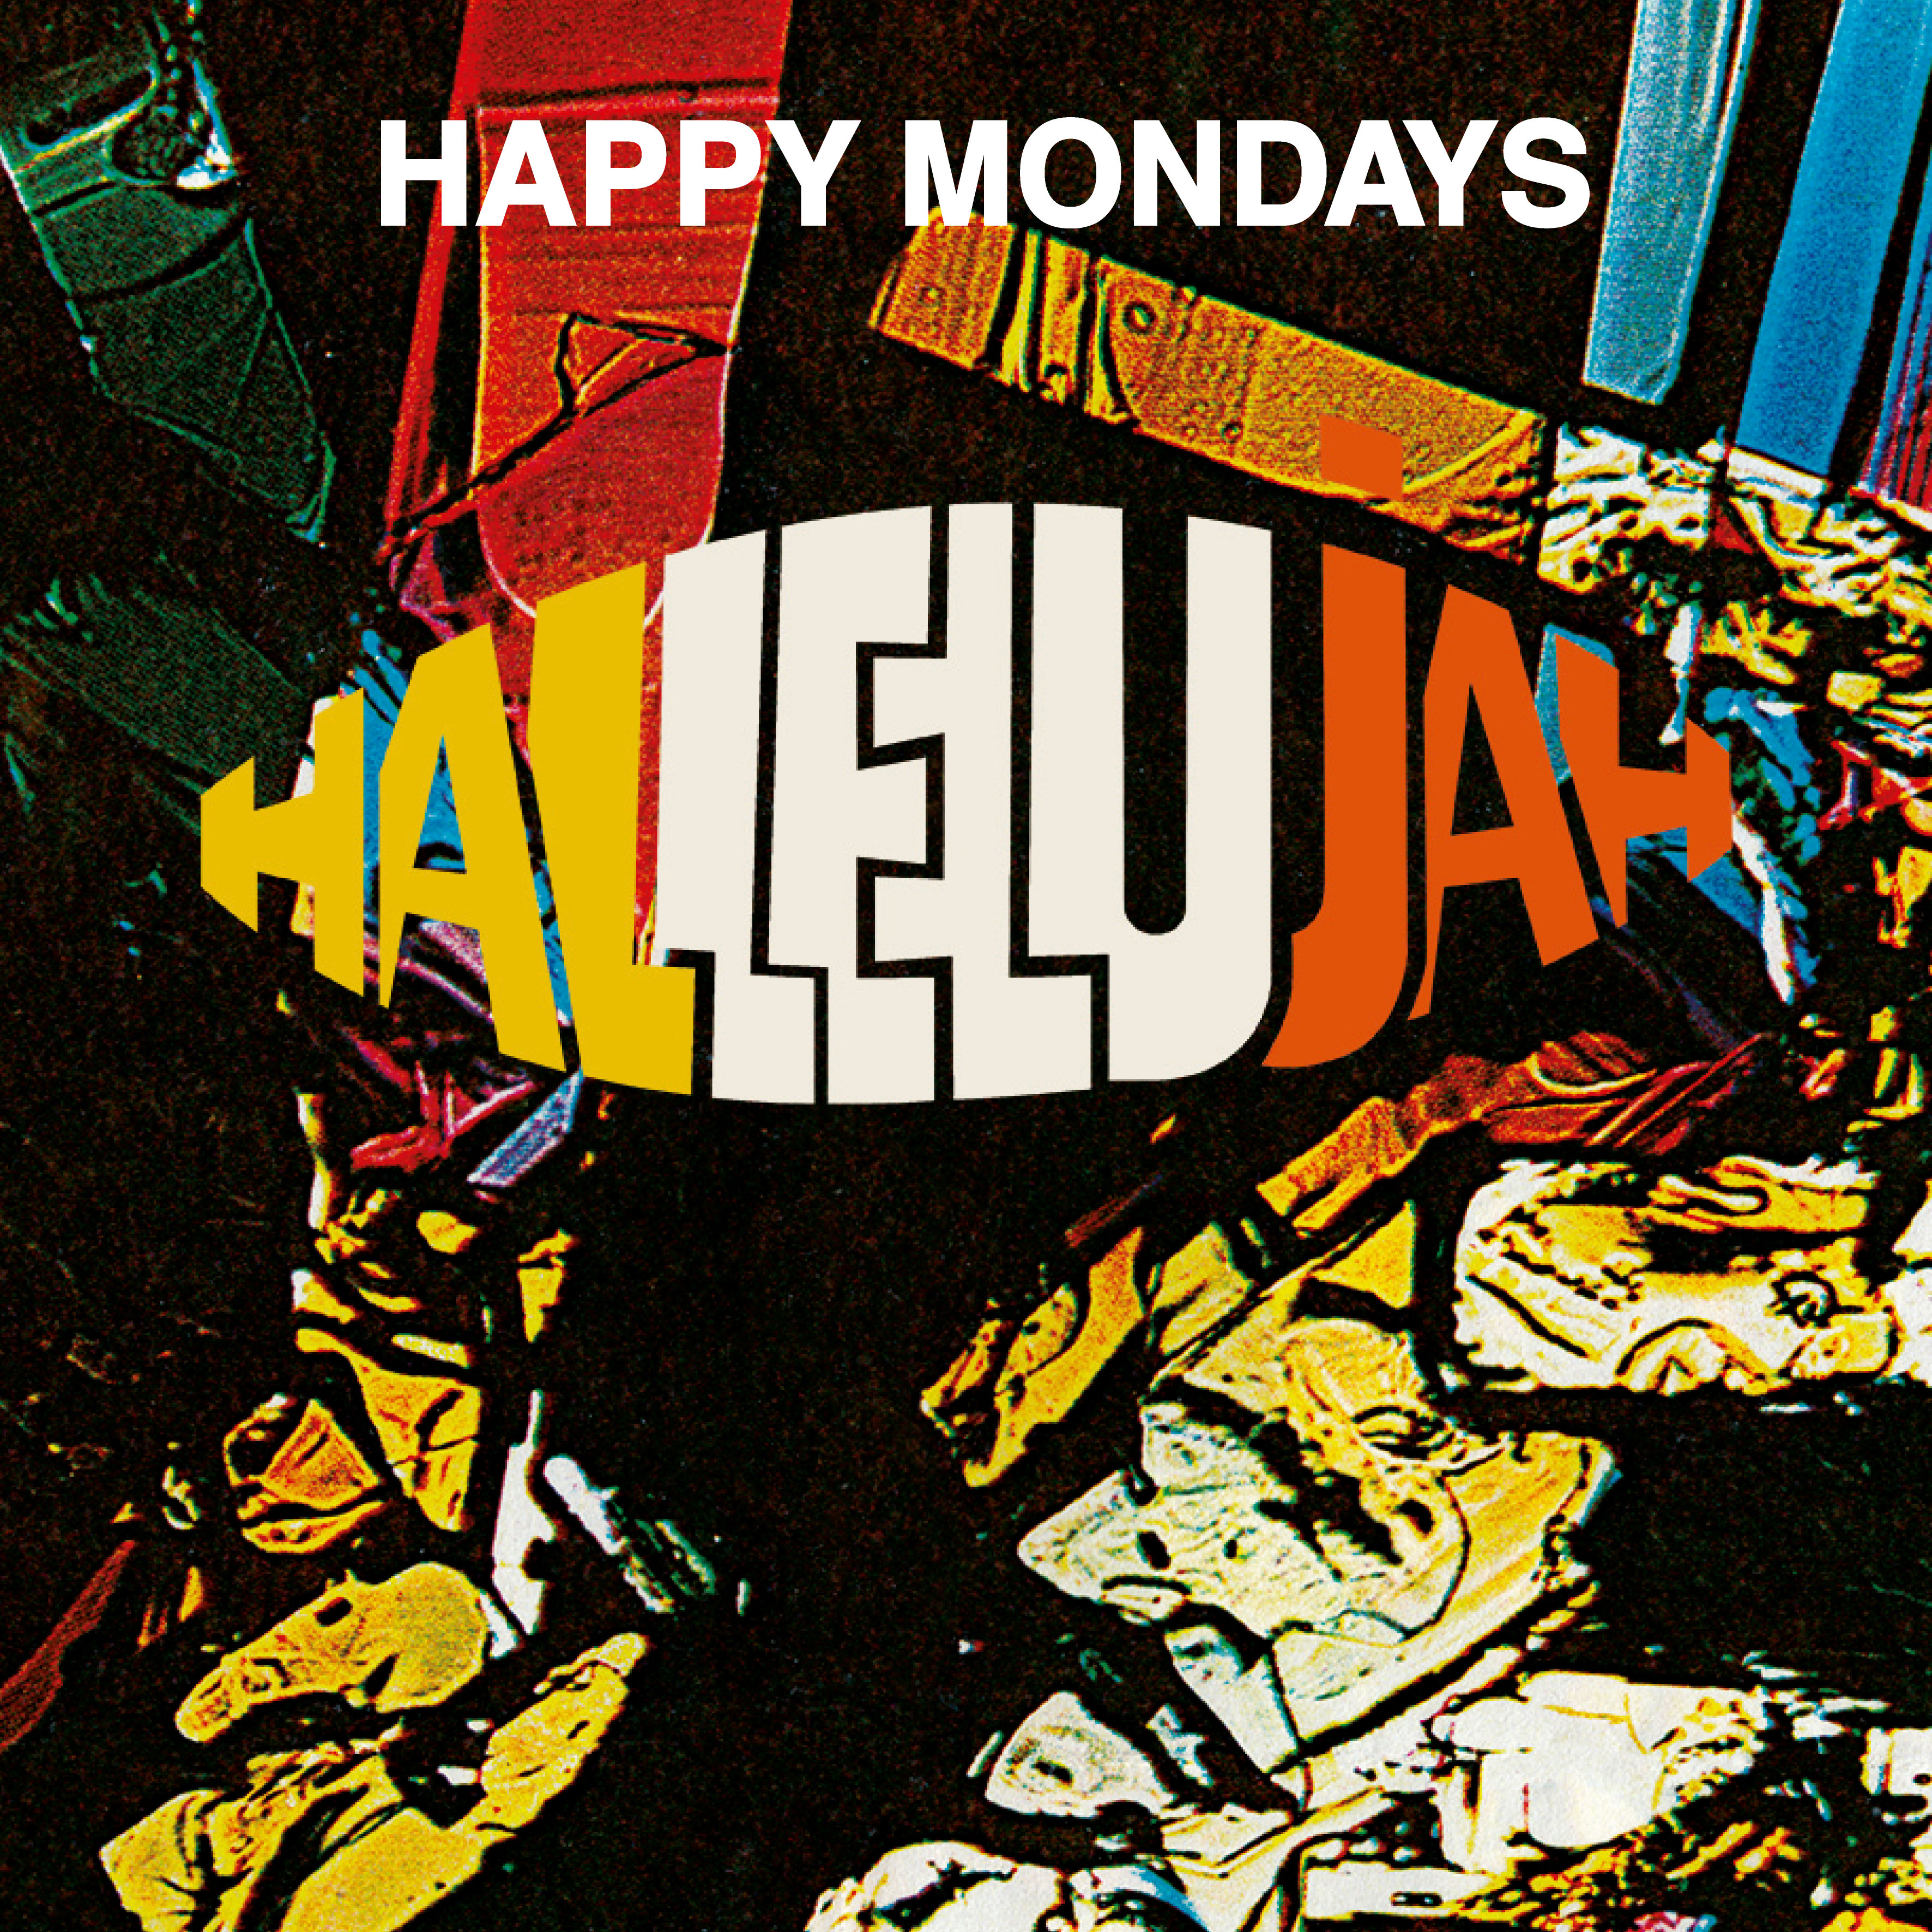 Hallelujah (Andrew Weatherall & Paul Oakenfold & Ewan Pearson mixes)